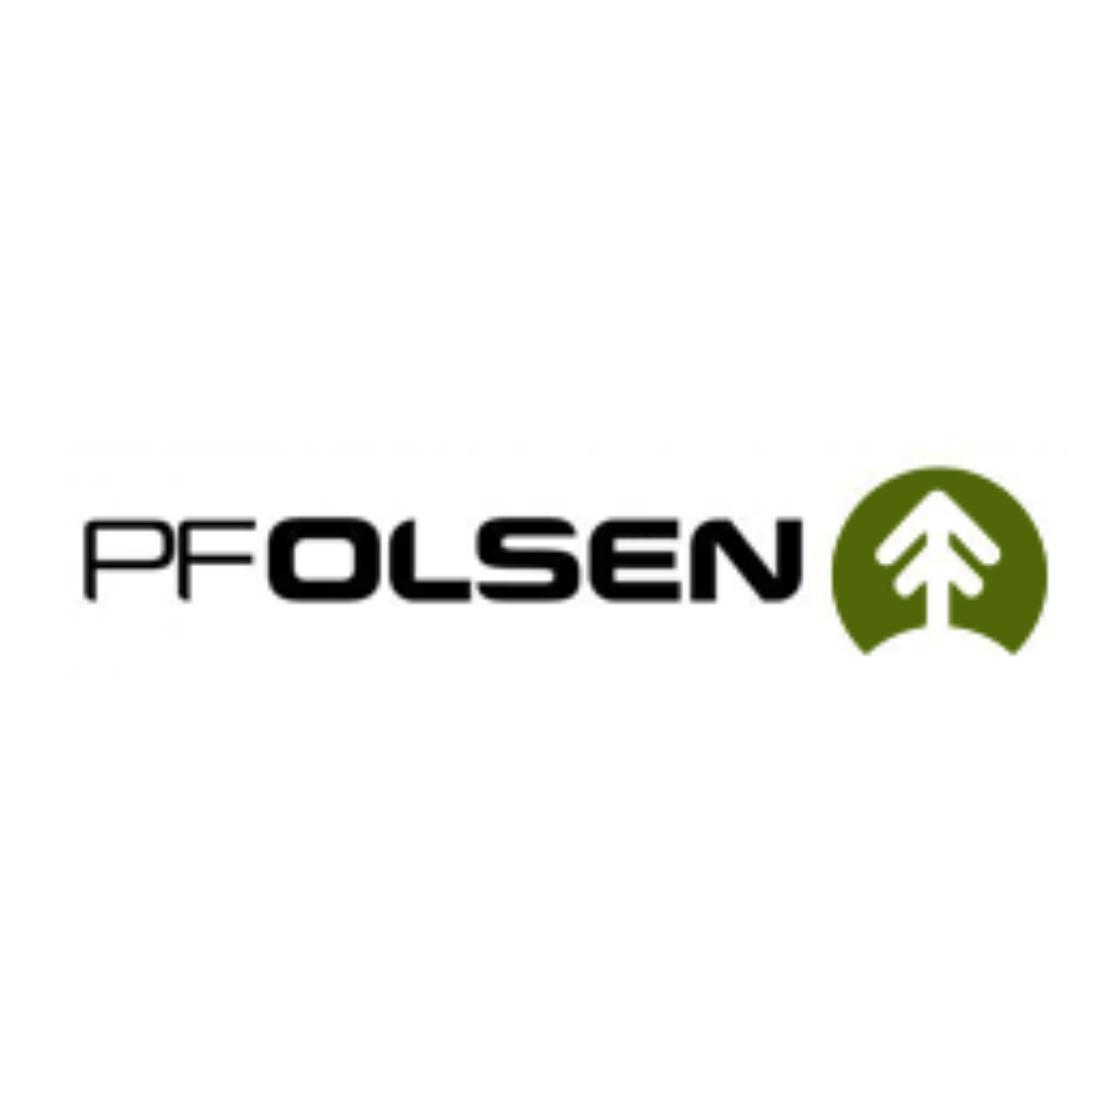 PF Olsen.png